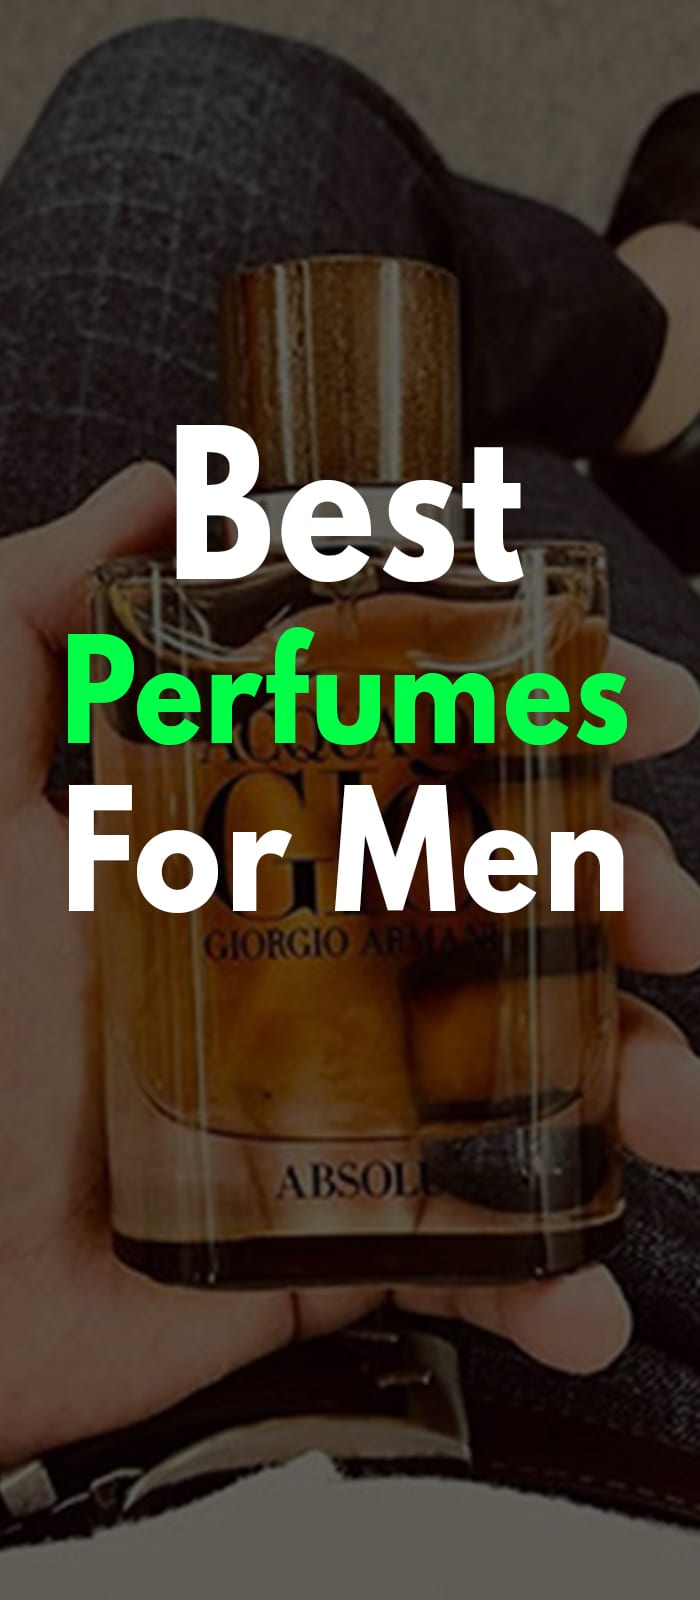 Aqua Di Gio EDP Perfumes for men !